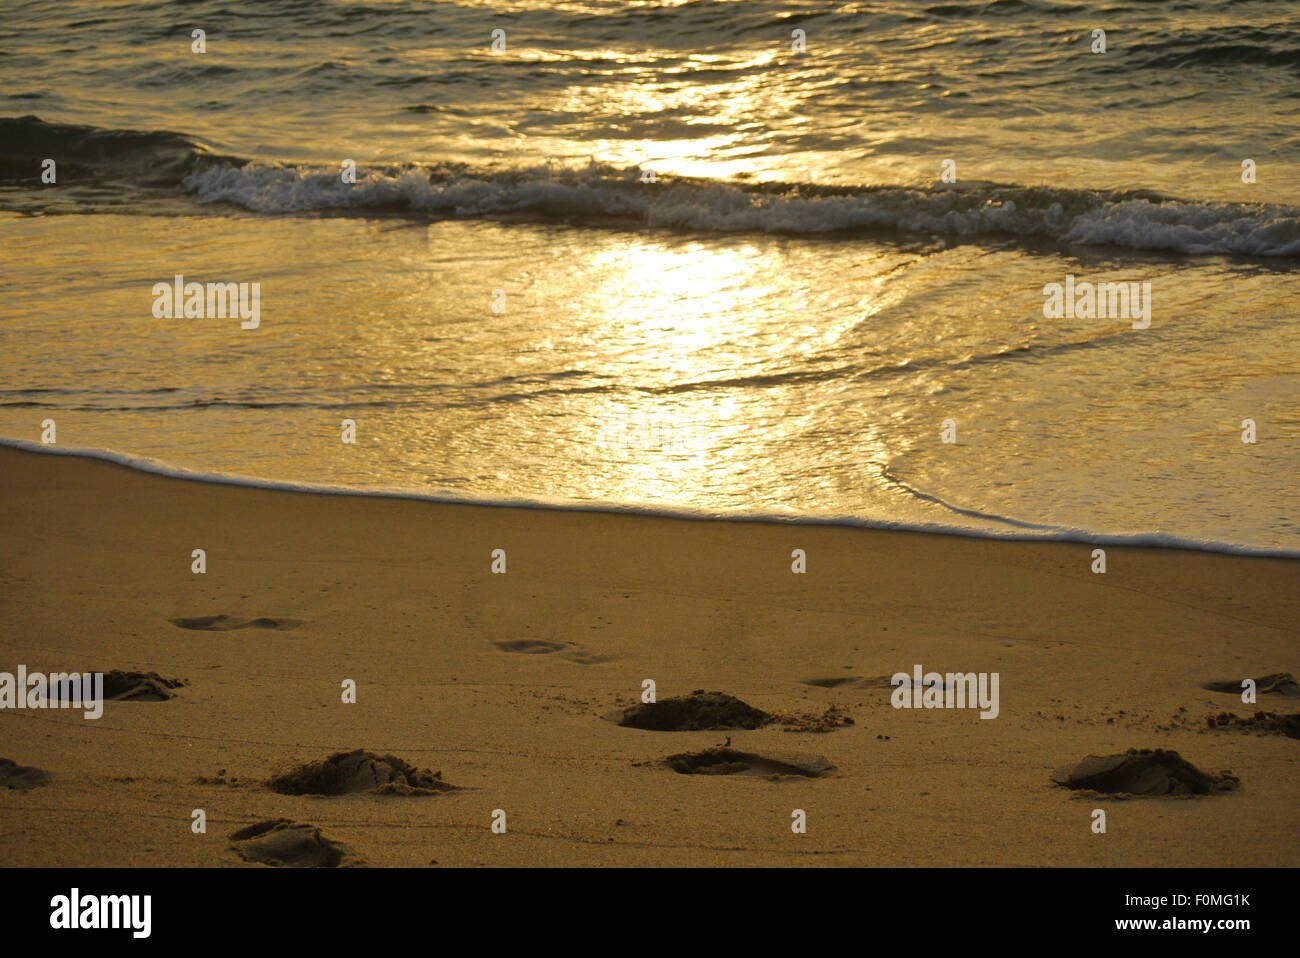 Orme lungo la spiaggia, a Banda Aceh e Sumatra, Indonesia Immagini Stock